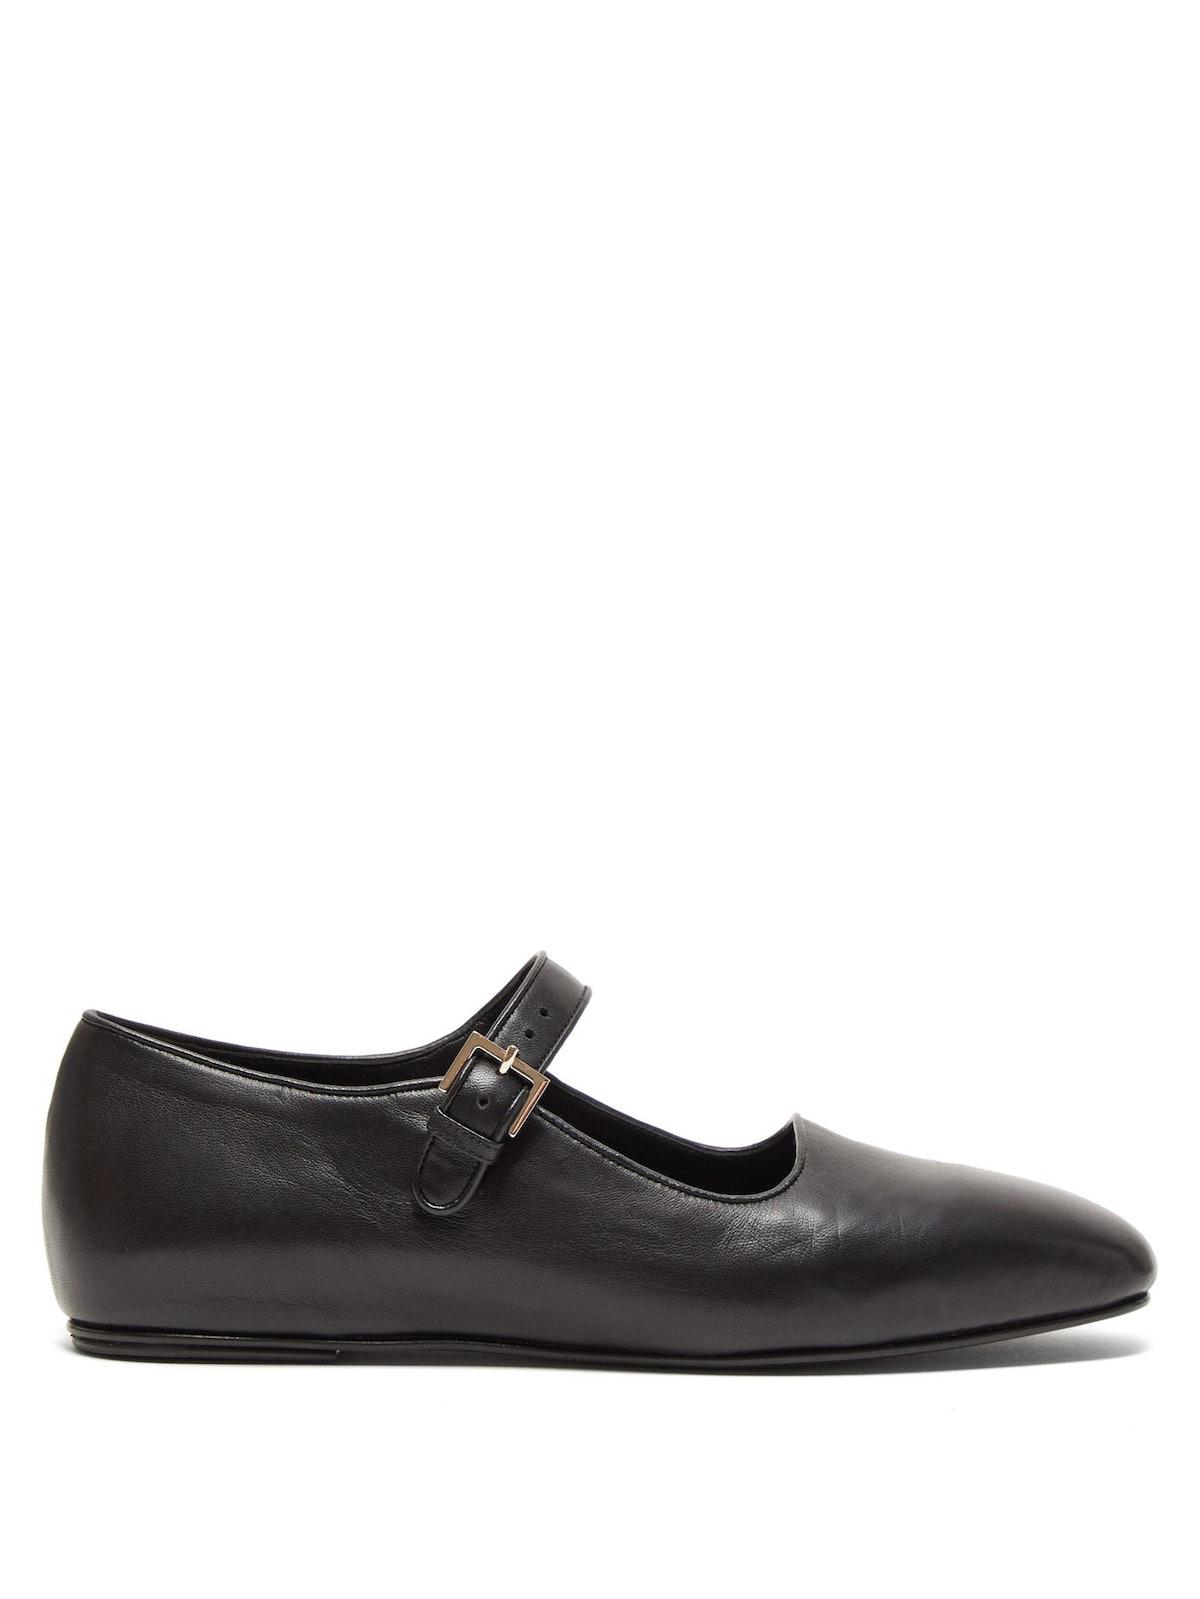 Ava Square-Toe Leather Mary-Jane Flats